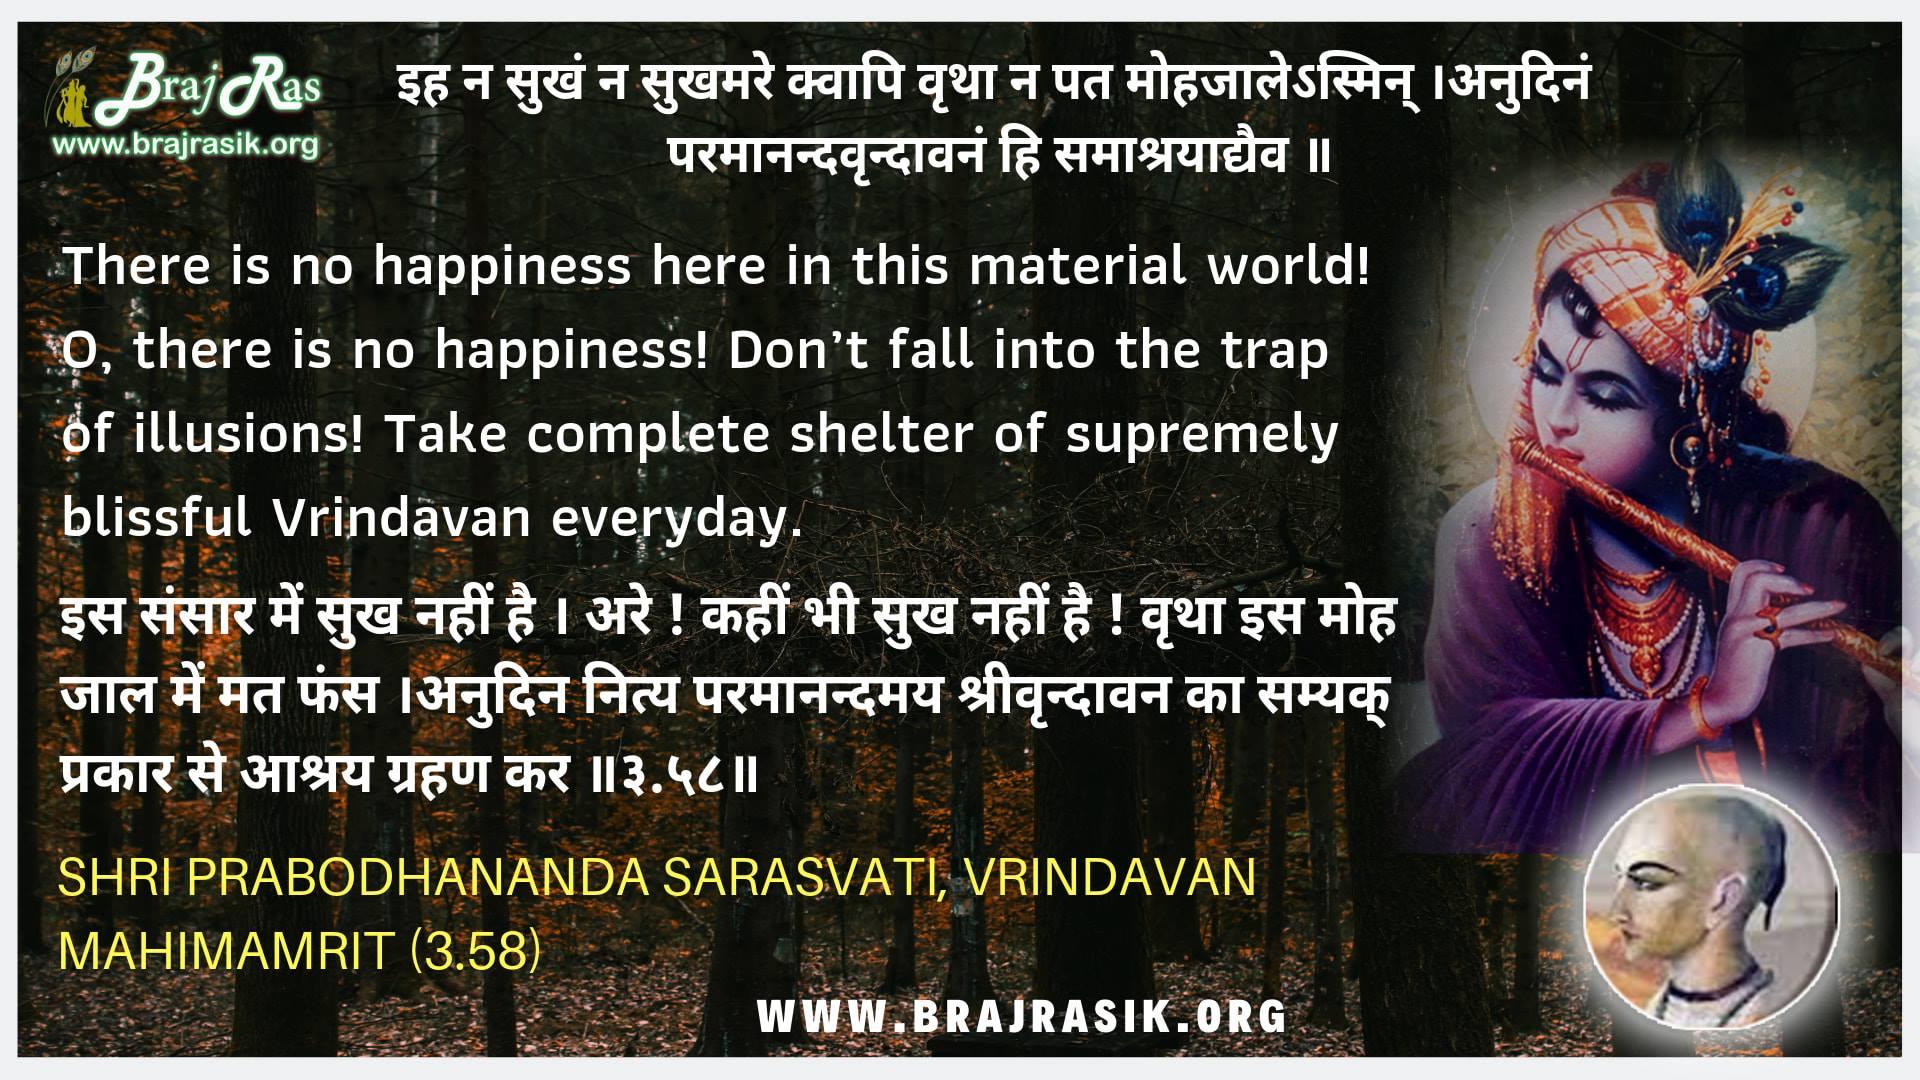 Iha Na Sukham Na Sukhmare Kapi - Shri Prabodhananda Sarasvati, Vrindavan Mahimamrit (3.58)